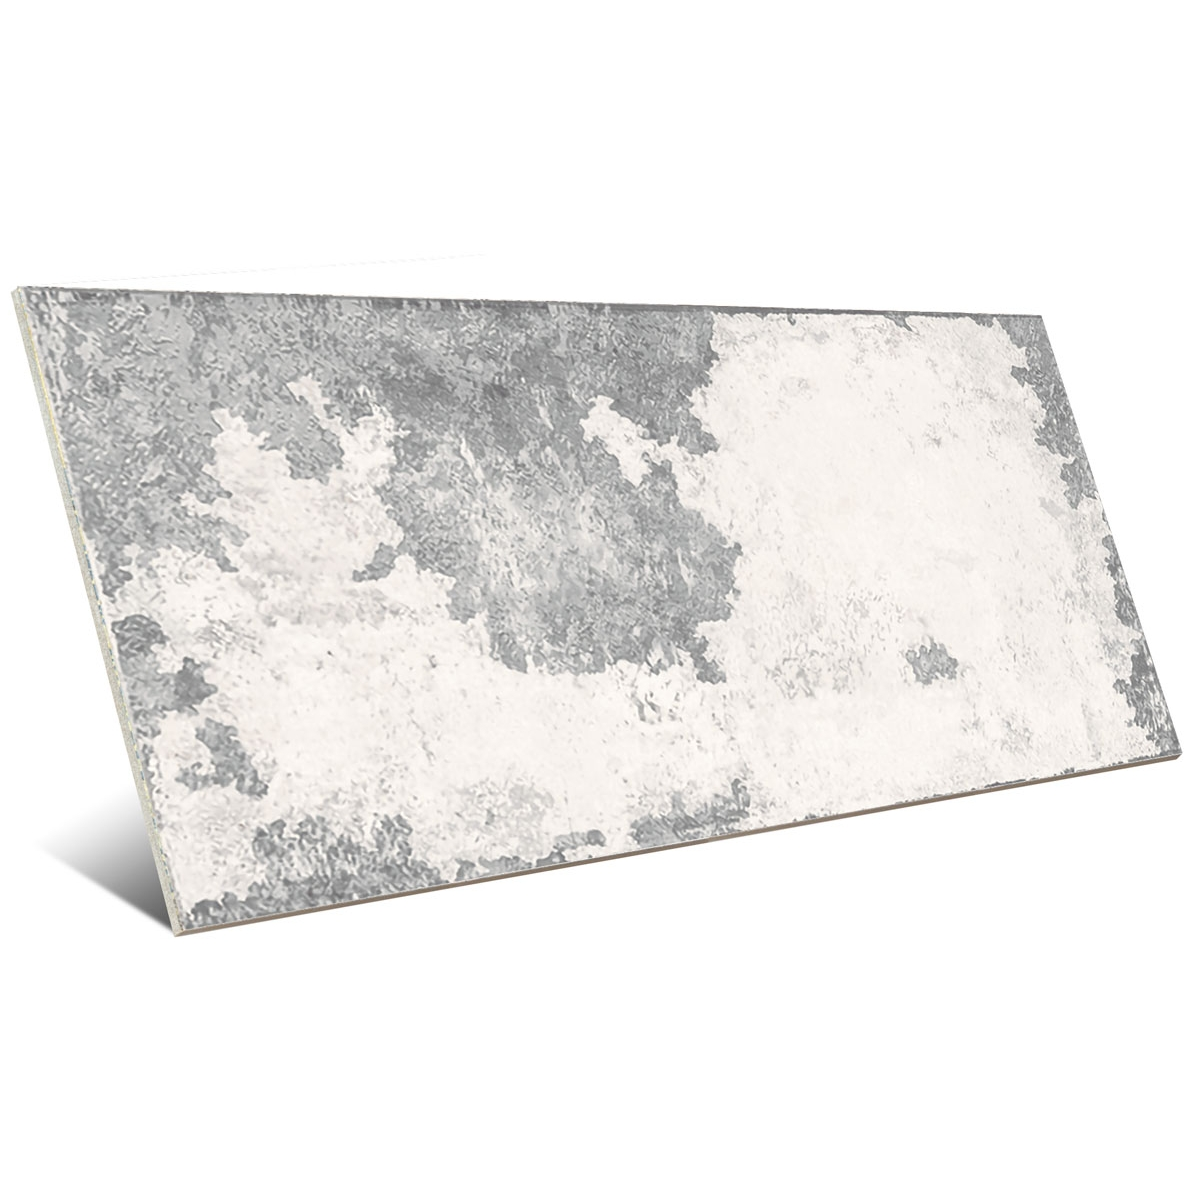 Biarritz Grey 7.5x15 (caja de 0.5 m2)